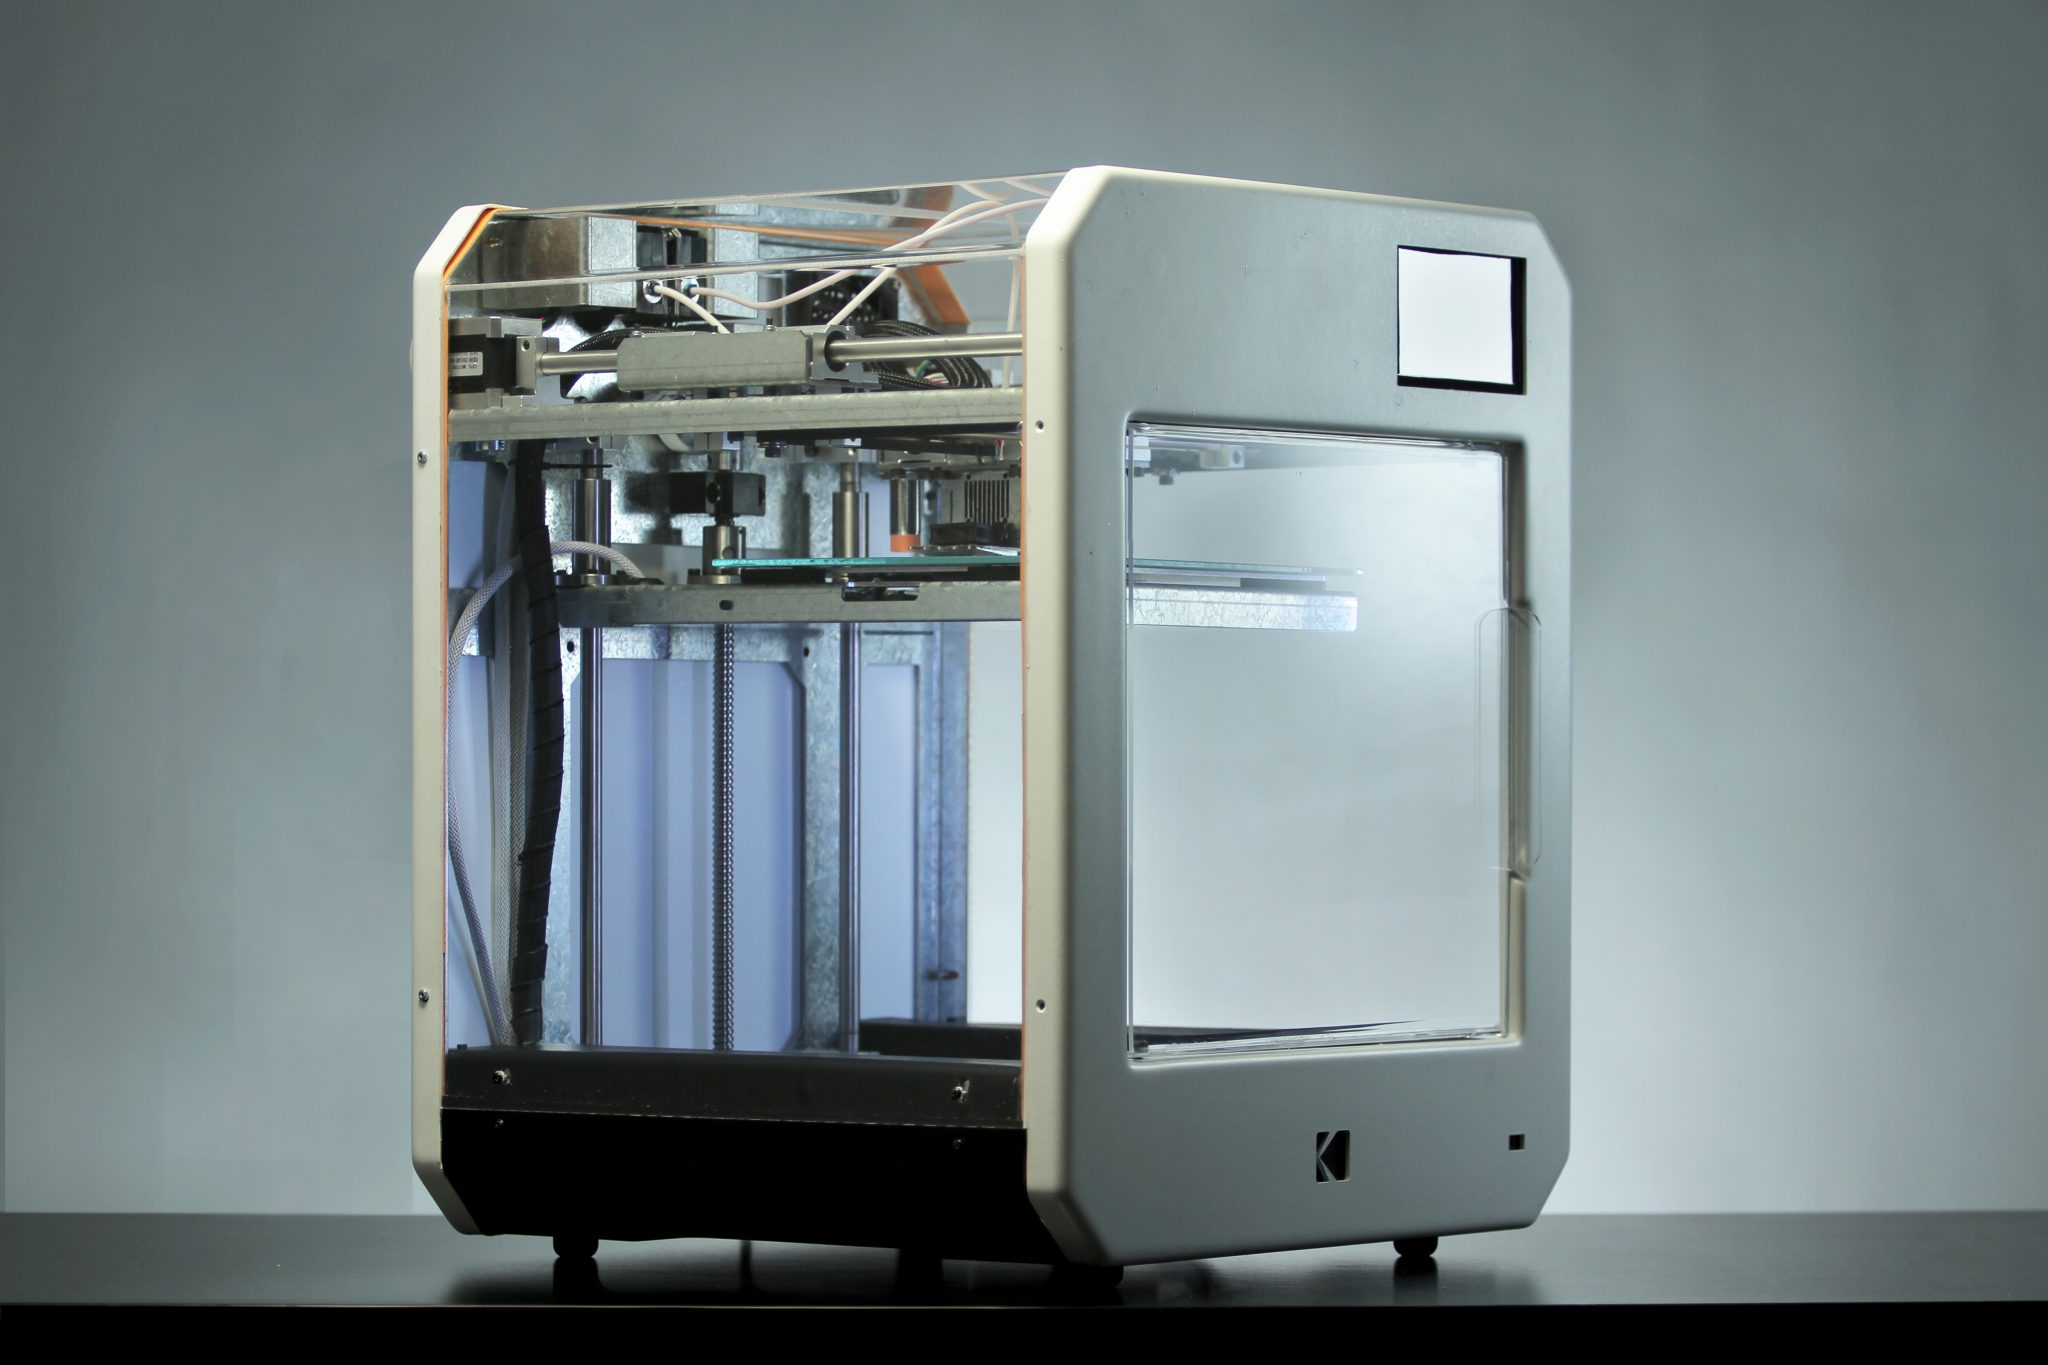 e09c9ad919 Kodak announces Design to Print Service for Portrait 3D printer at ...